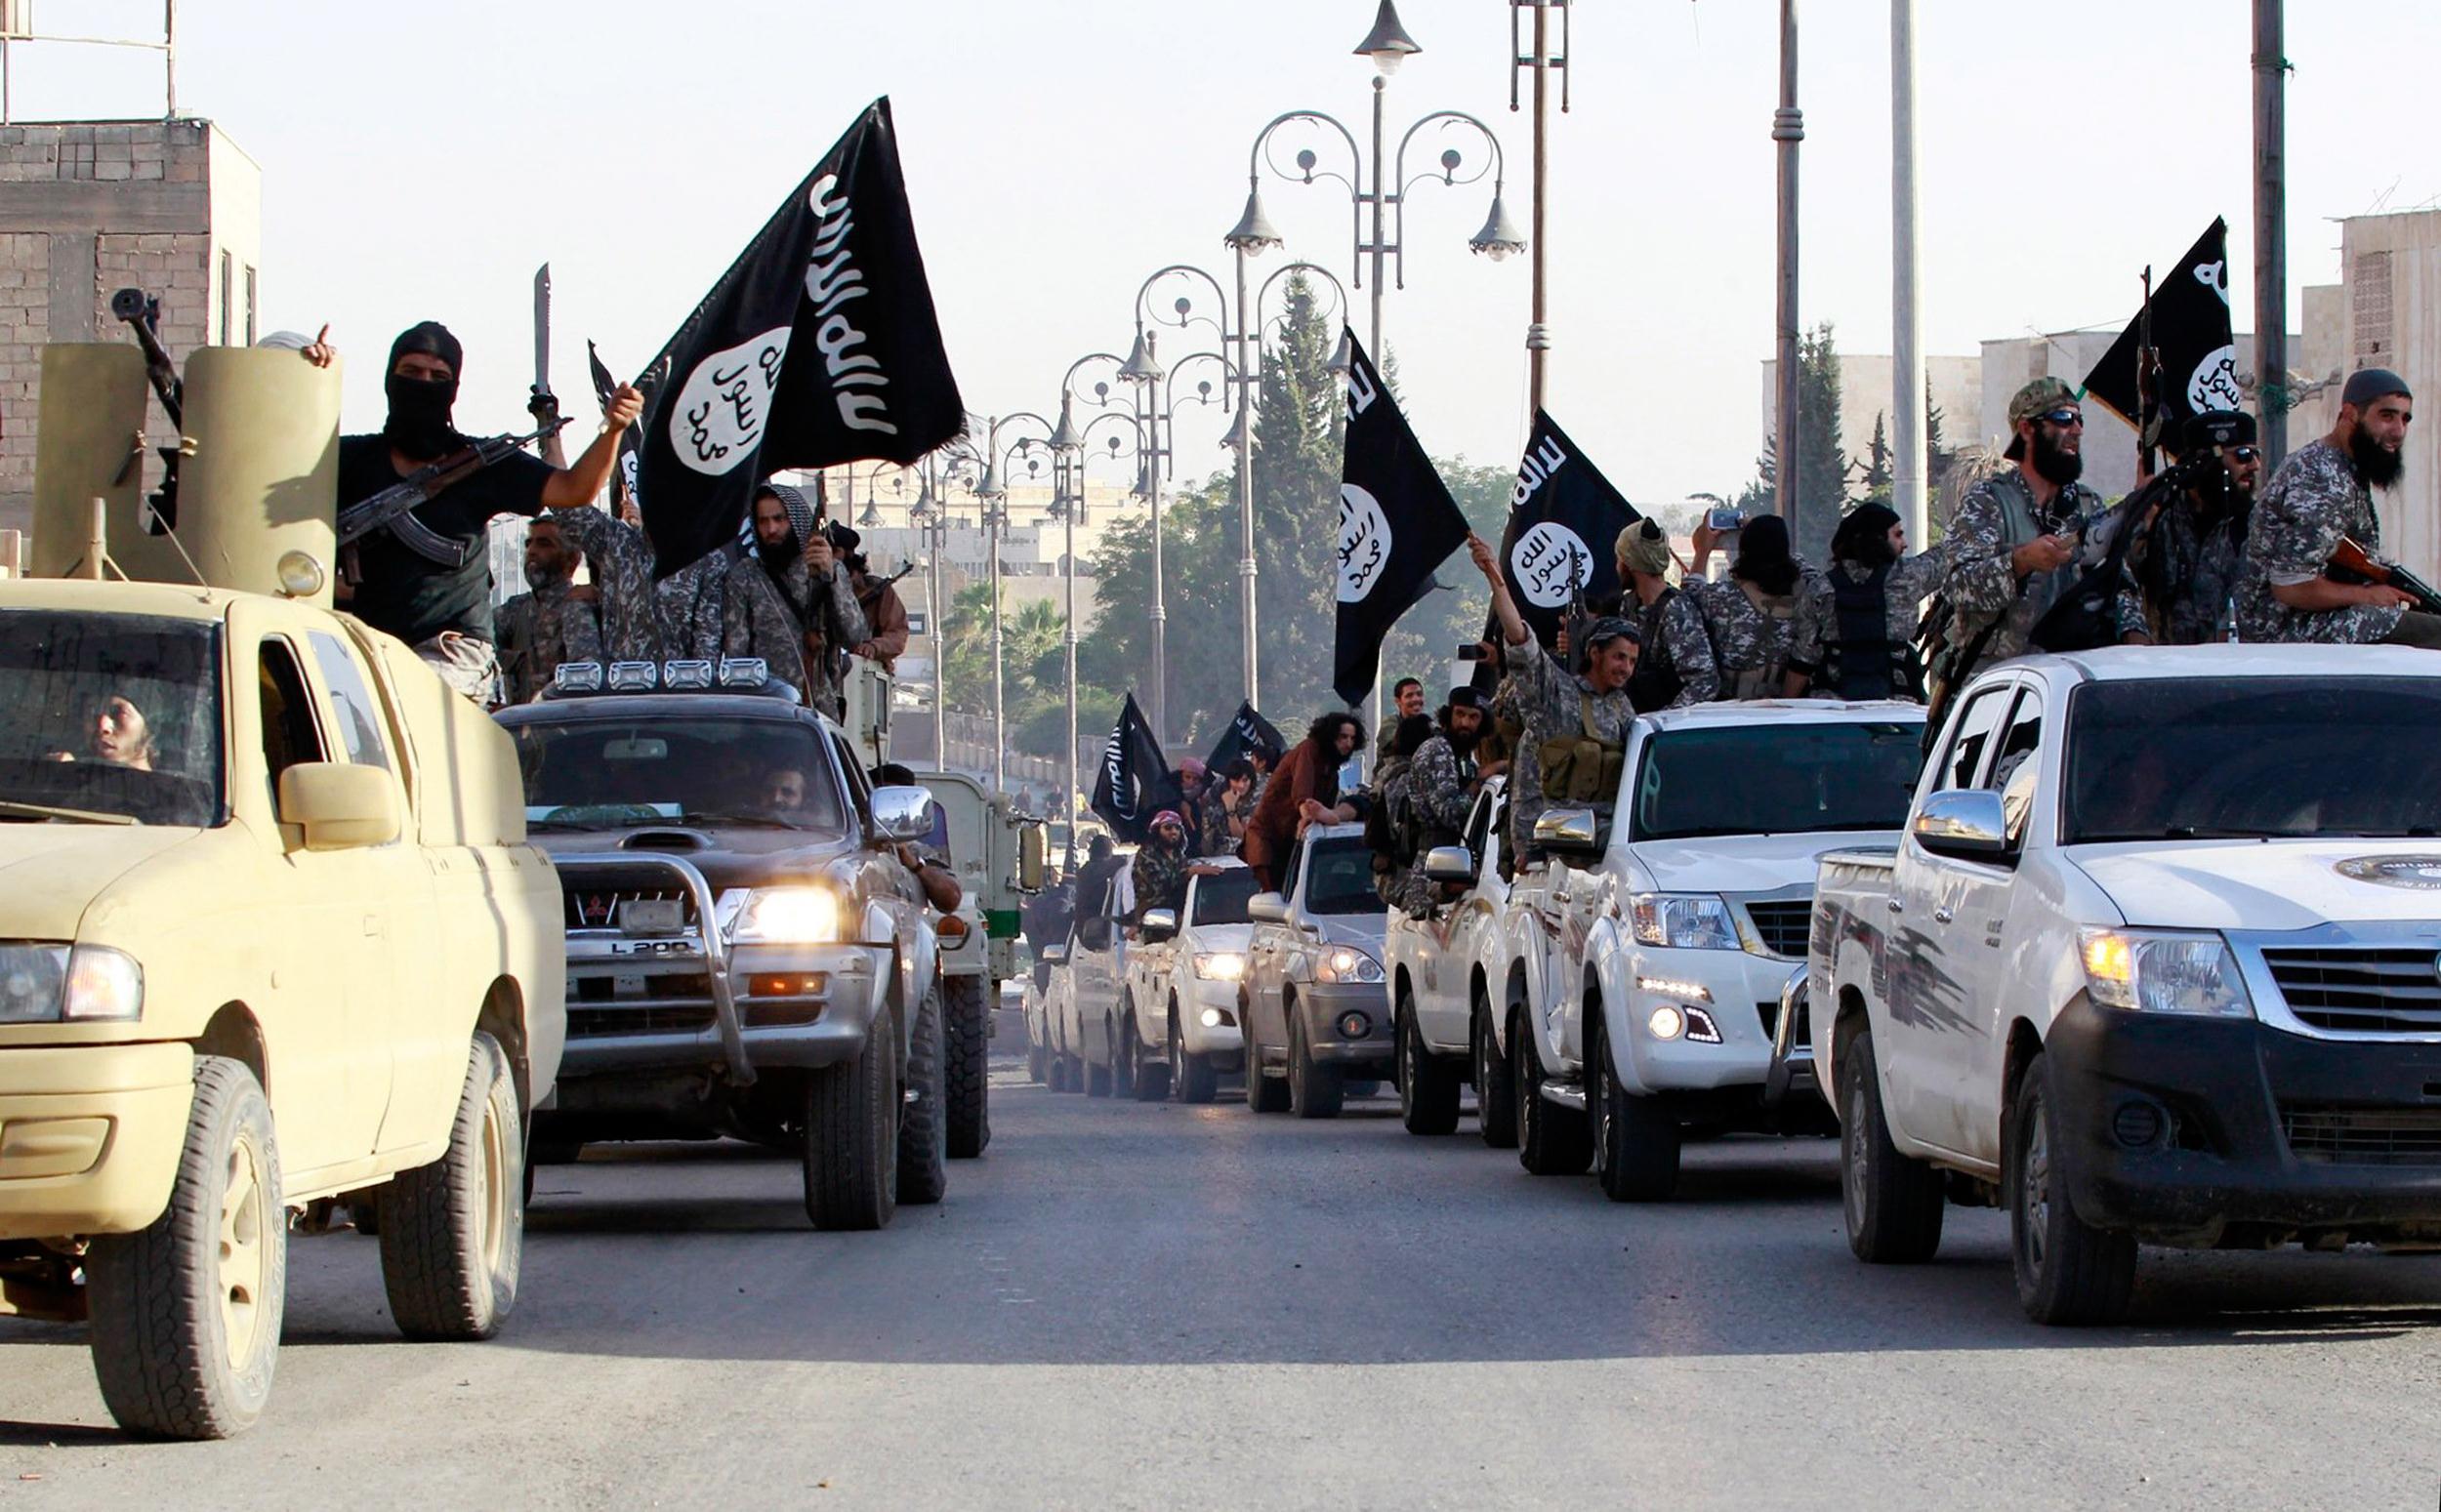 140702-syria-isis-parade-raqqa-1053a_319361e42828771c967a349960c81eab